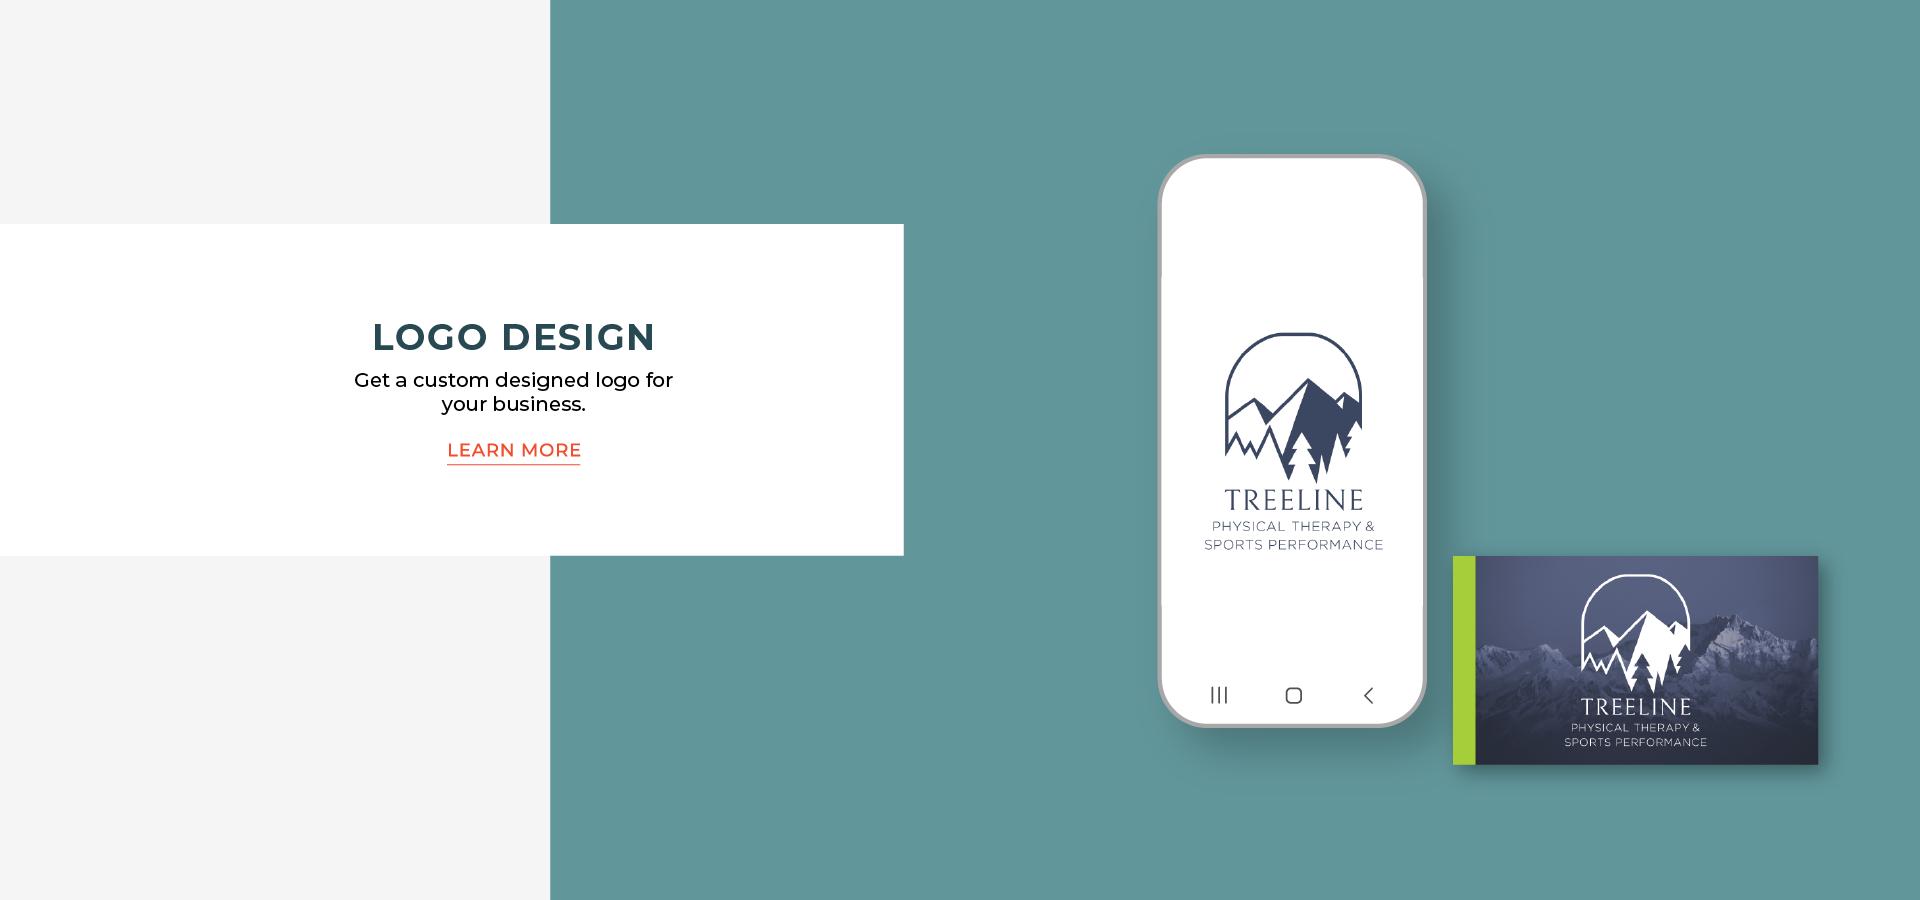 kat fox design logo design services